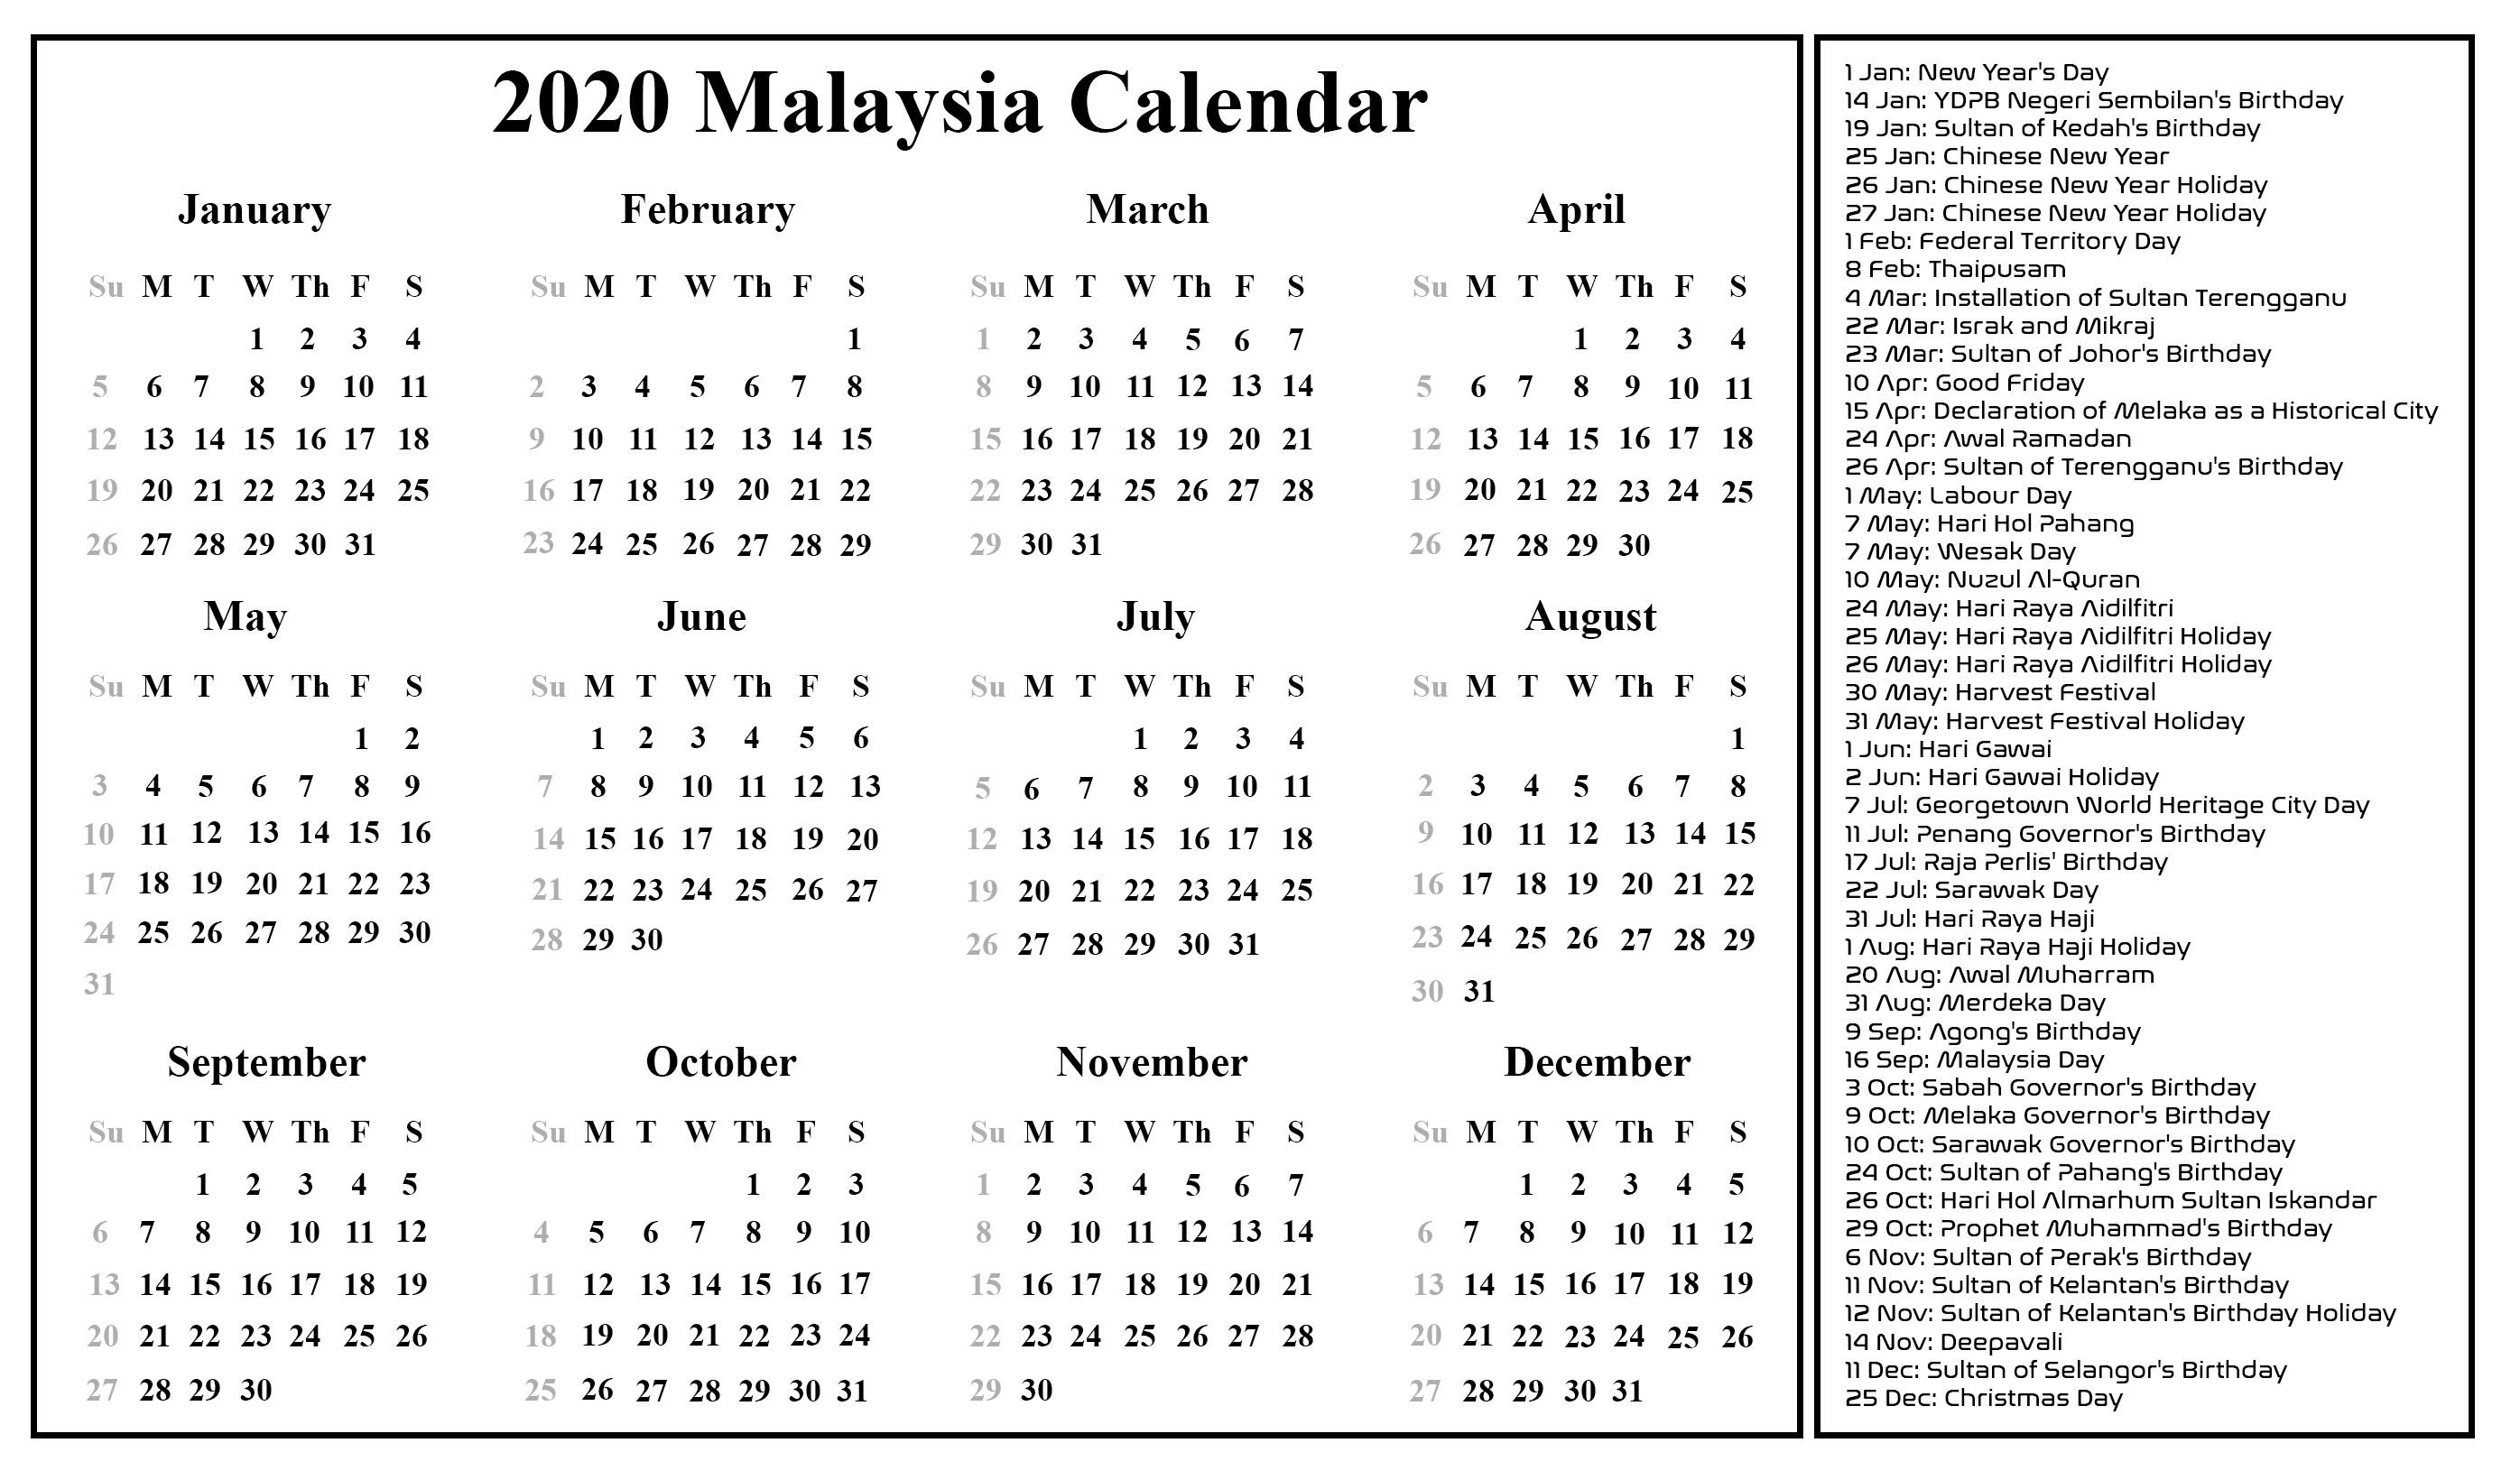 Download Free Blank Malaysia Calendar 2020 Template In Pdf